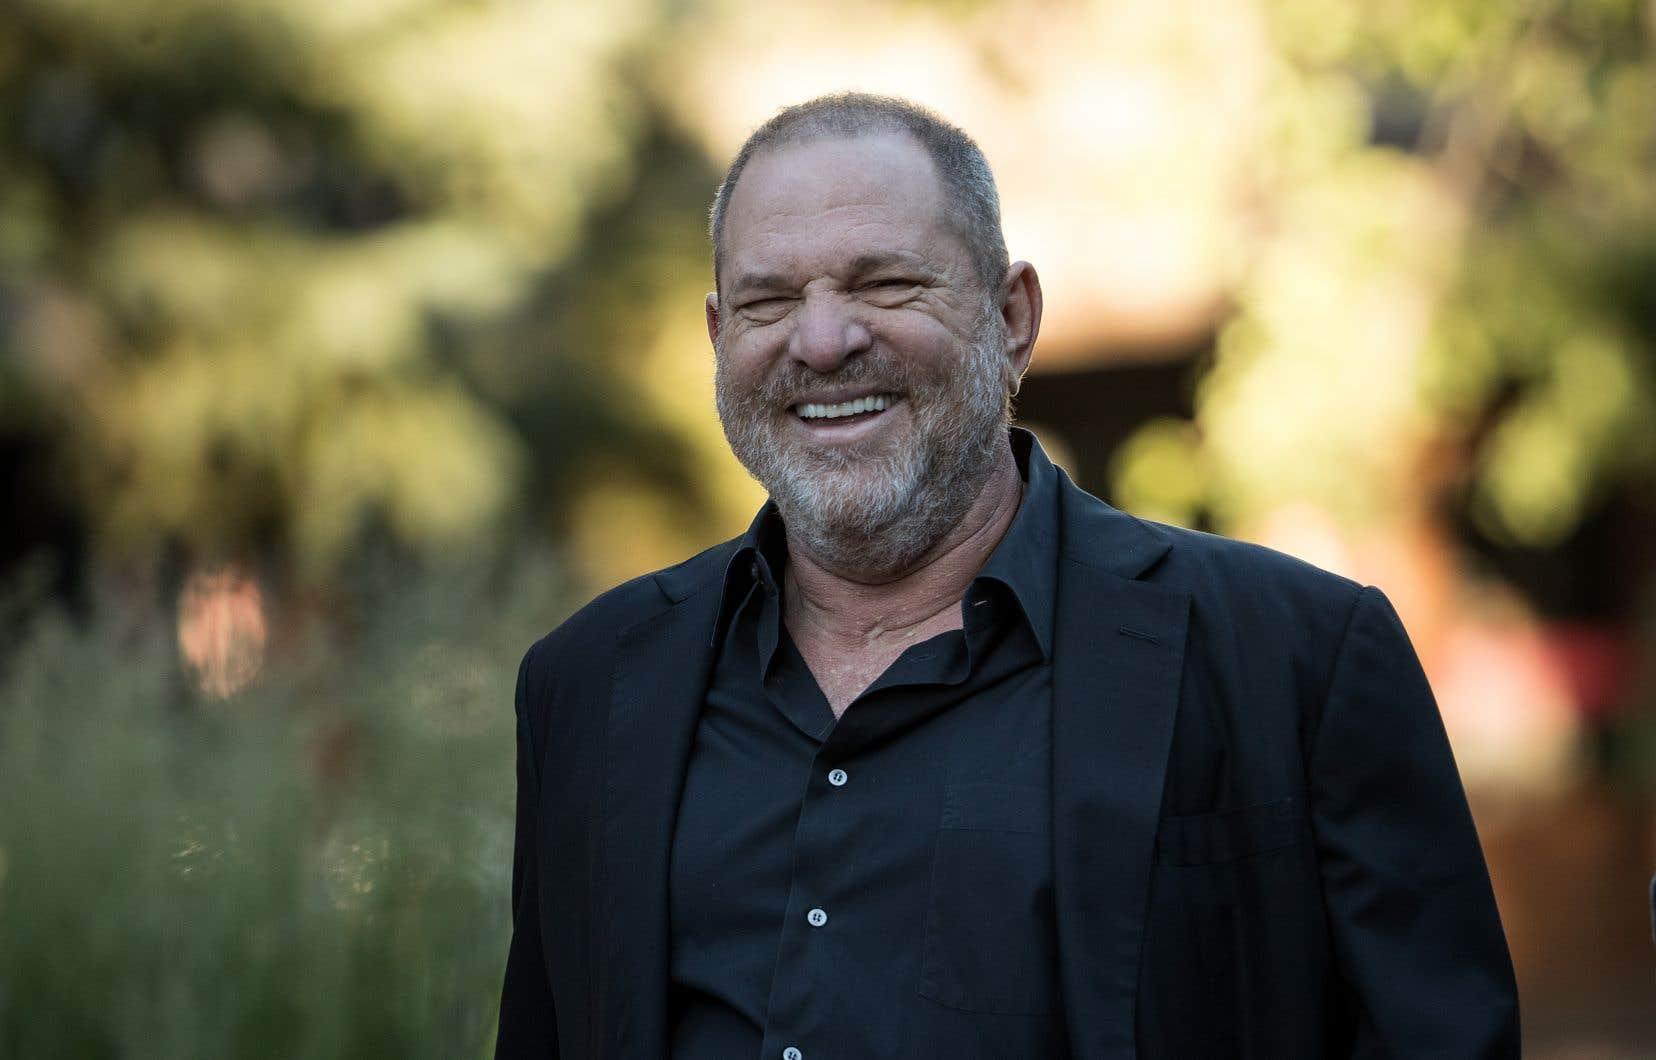 Le producteur américainHarvey Weinstein